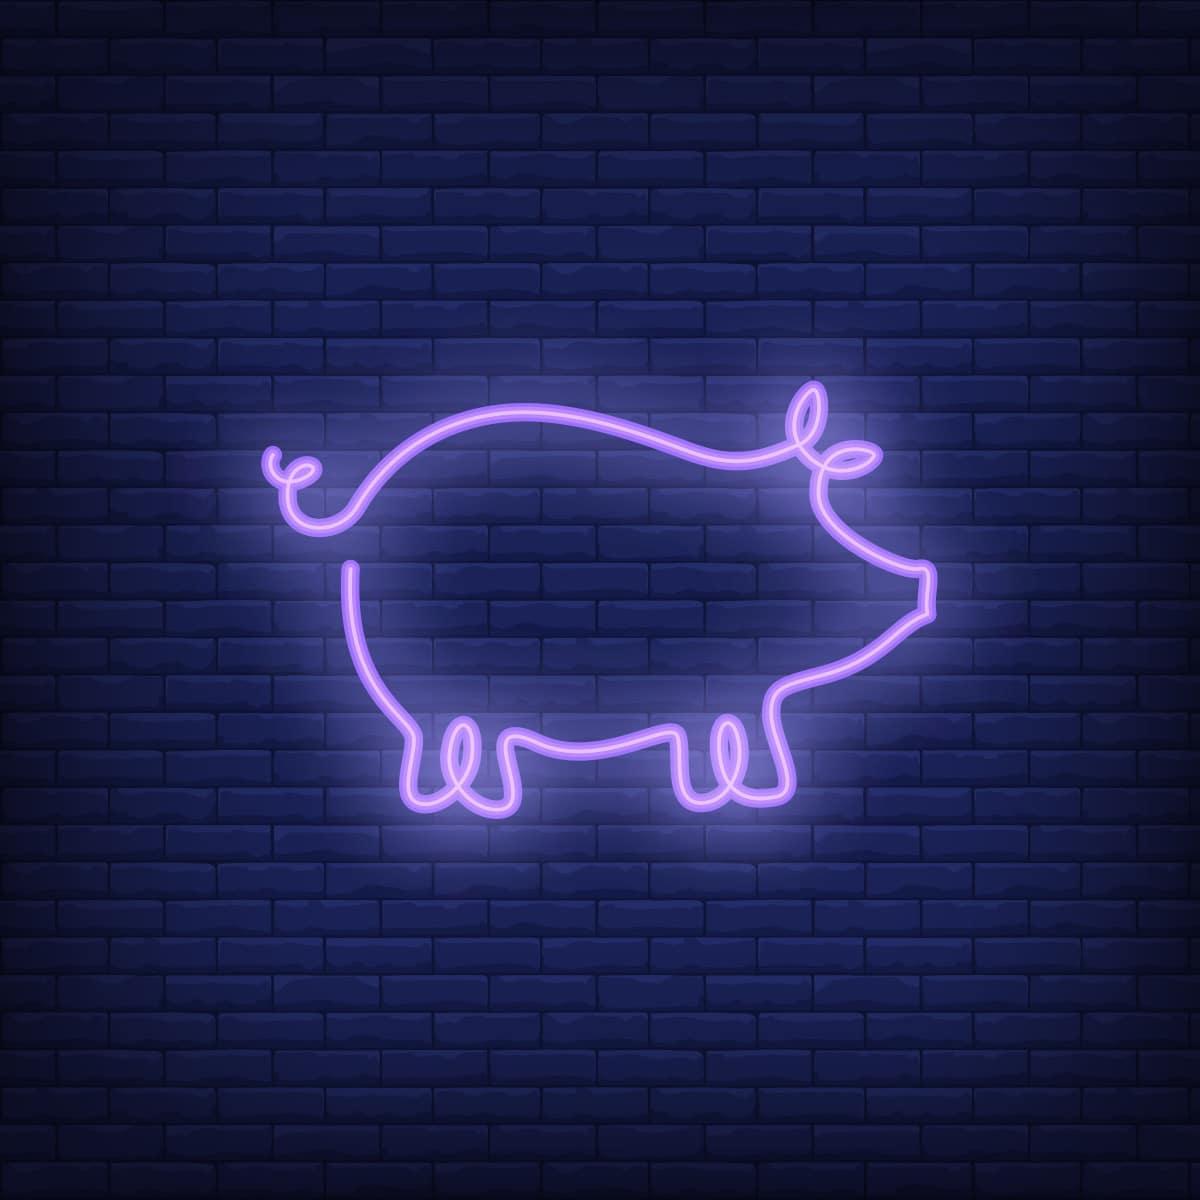 Pig shape neon sign template. Night bright advertisement. Vector illustration for restaurant, cafe, diner, menu, advertising design